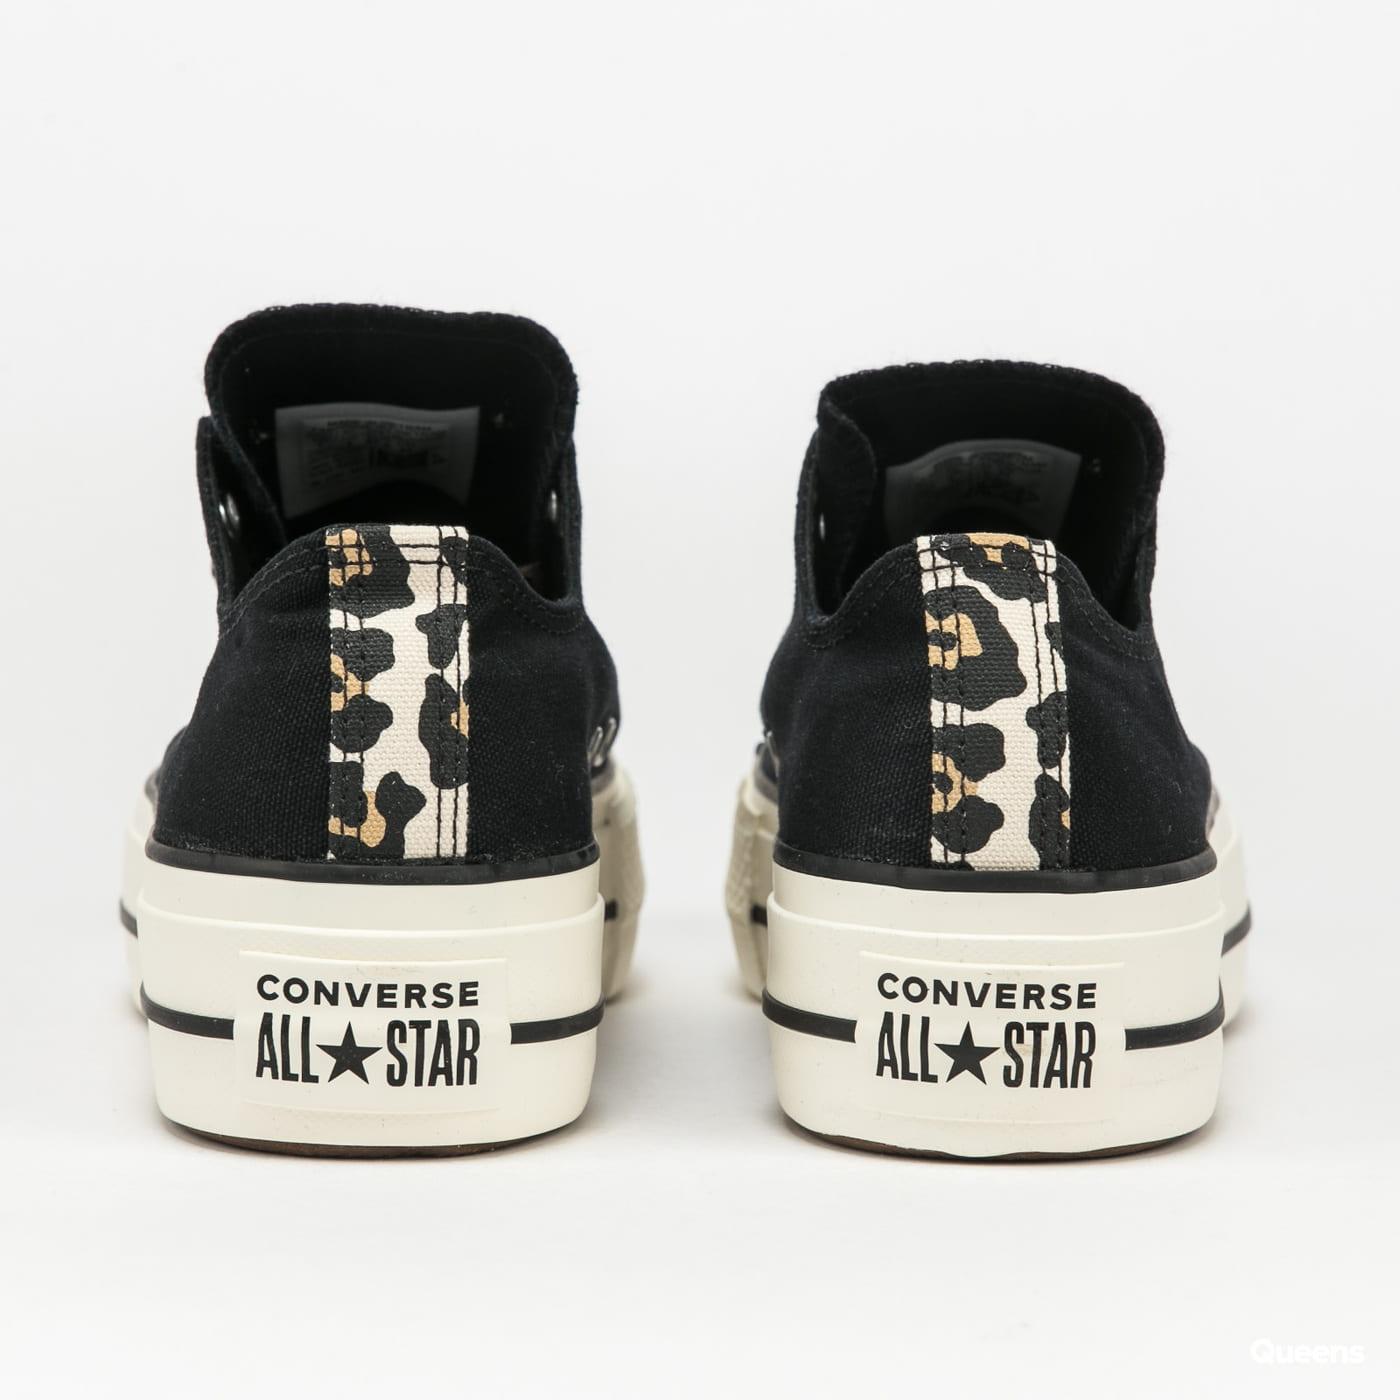 Converse Chuck Taylor All Star Lift OX black / light fawn / egret